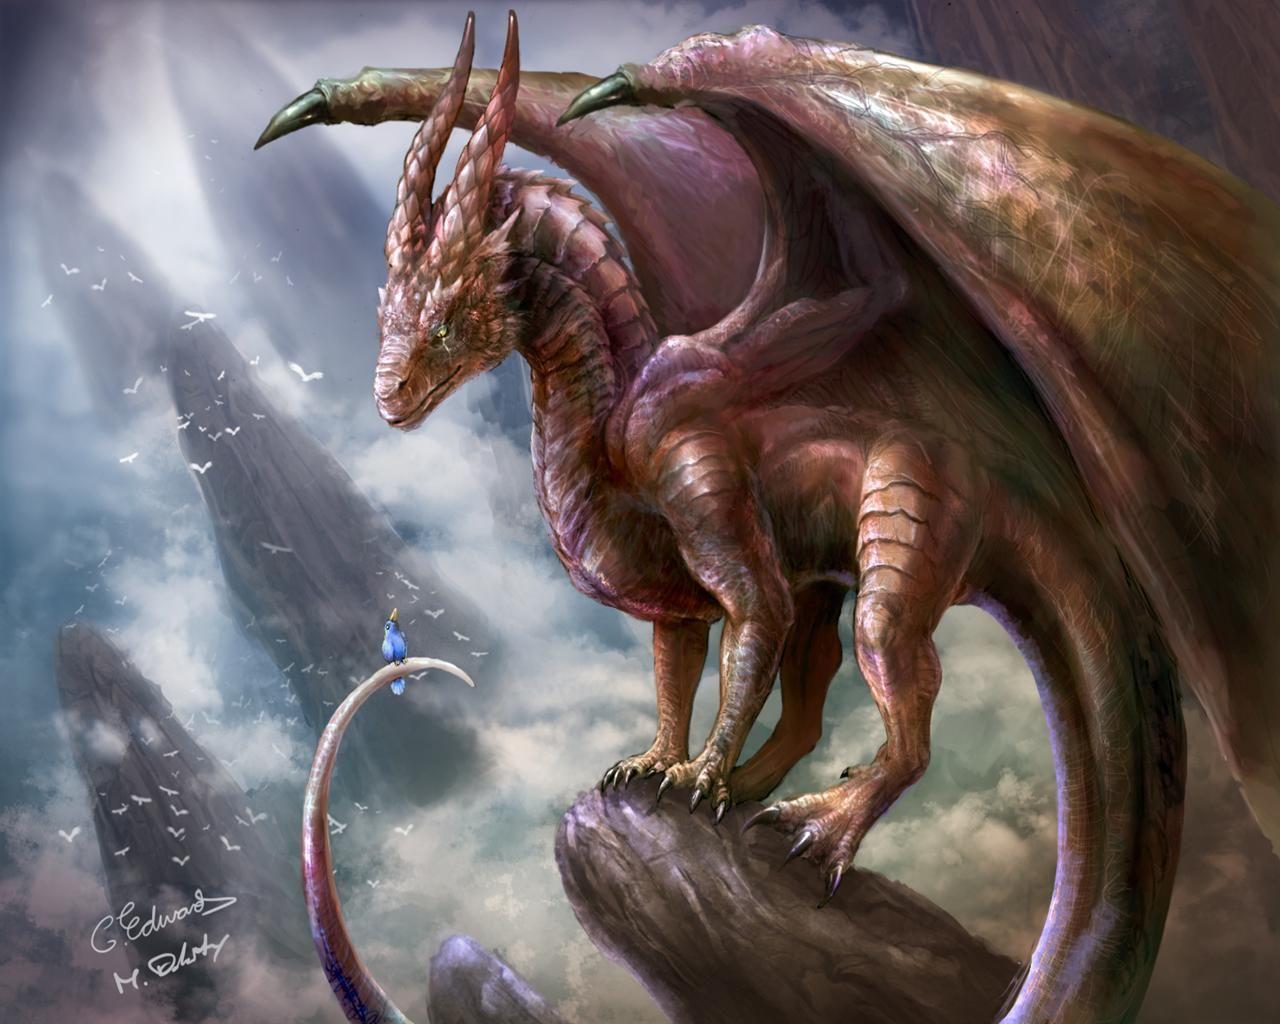 Httpdarkpozadiaimageswallpapers55529422dragonsdragin httpdarkpozadiaimageswallpapers55529422dragonsdragin20with20birdg fantasy dragons pinterest dragons fantasy dragon and wallpaper voltagebd Choice Image